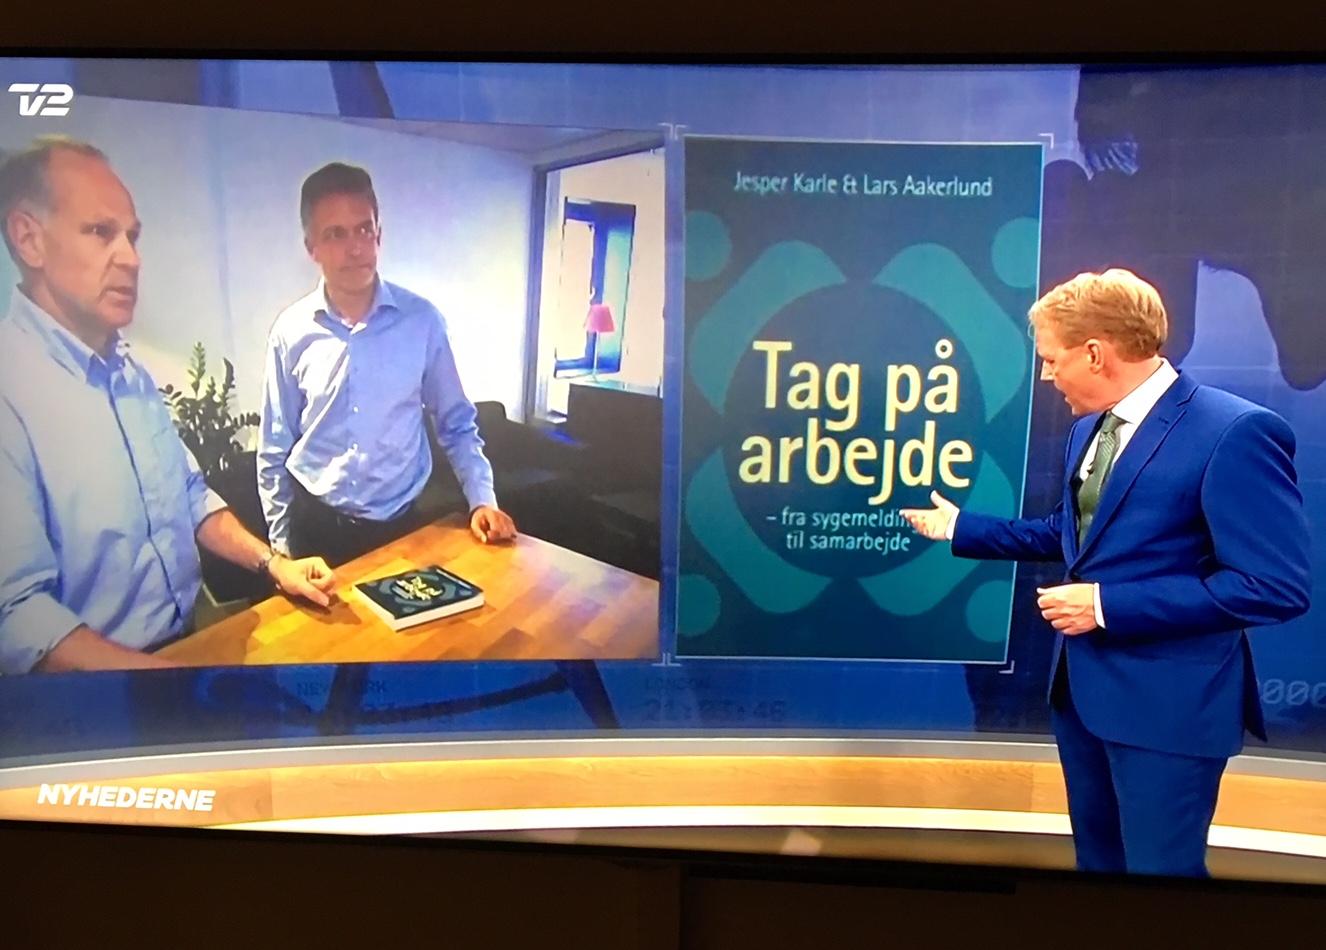 Tag_paa_arbejde_tv2